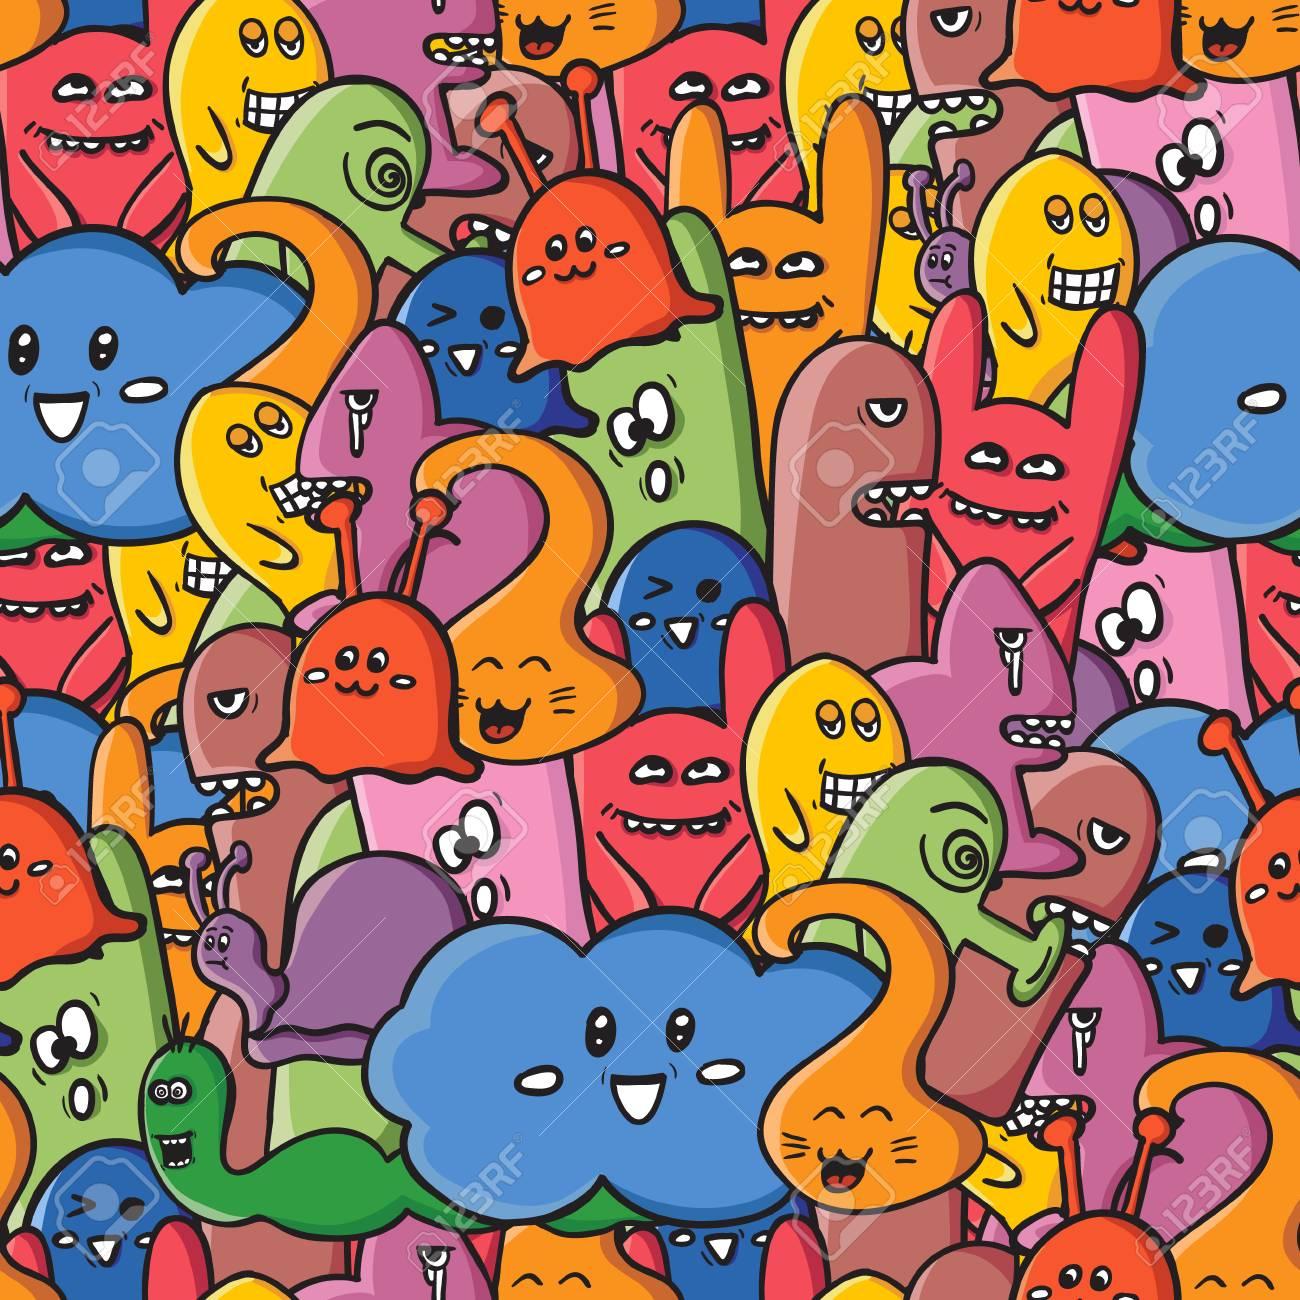 Lustige Monster Graffiti Hand Gezeichnete Skizze Kunst Doodle